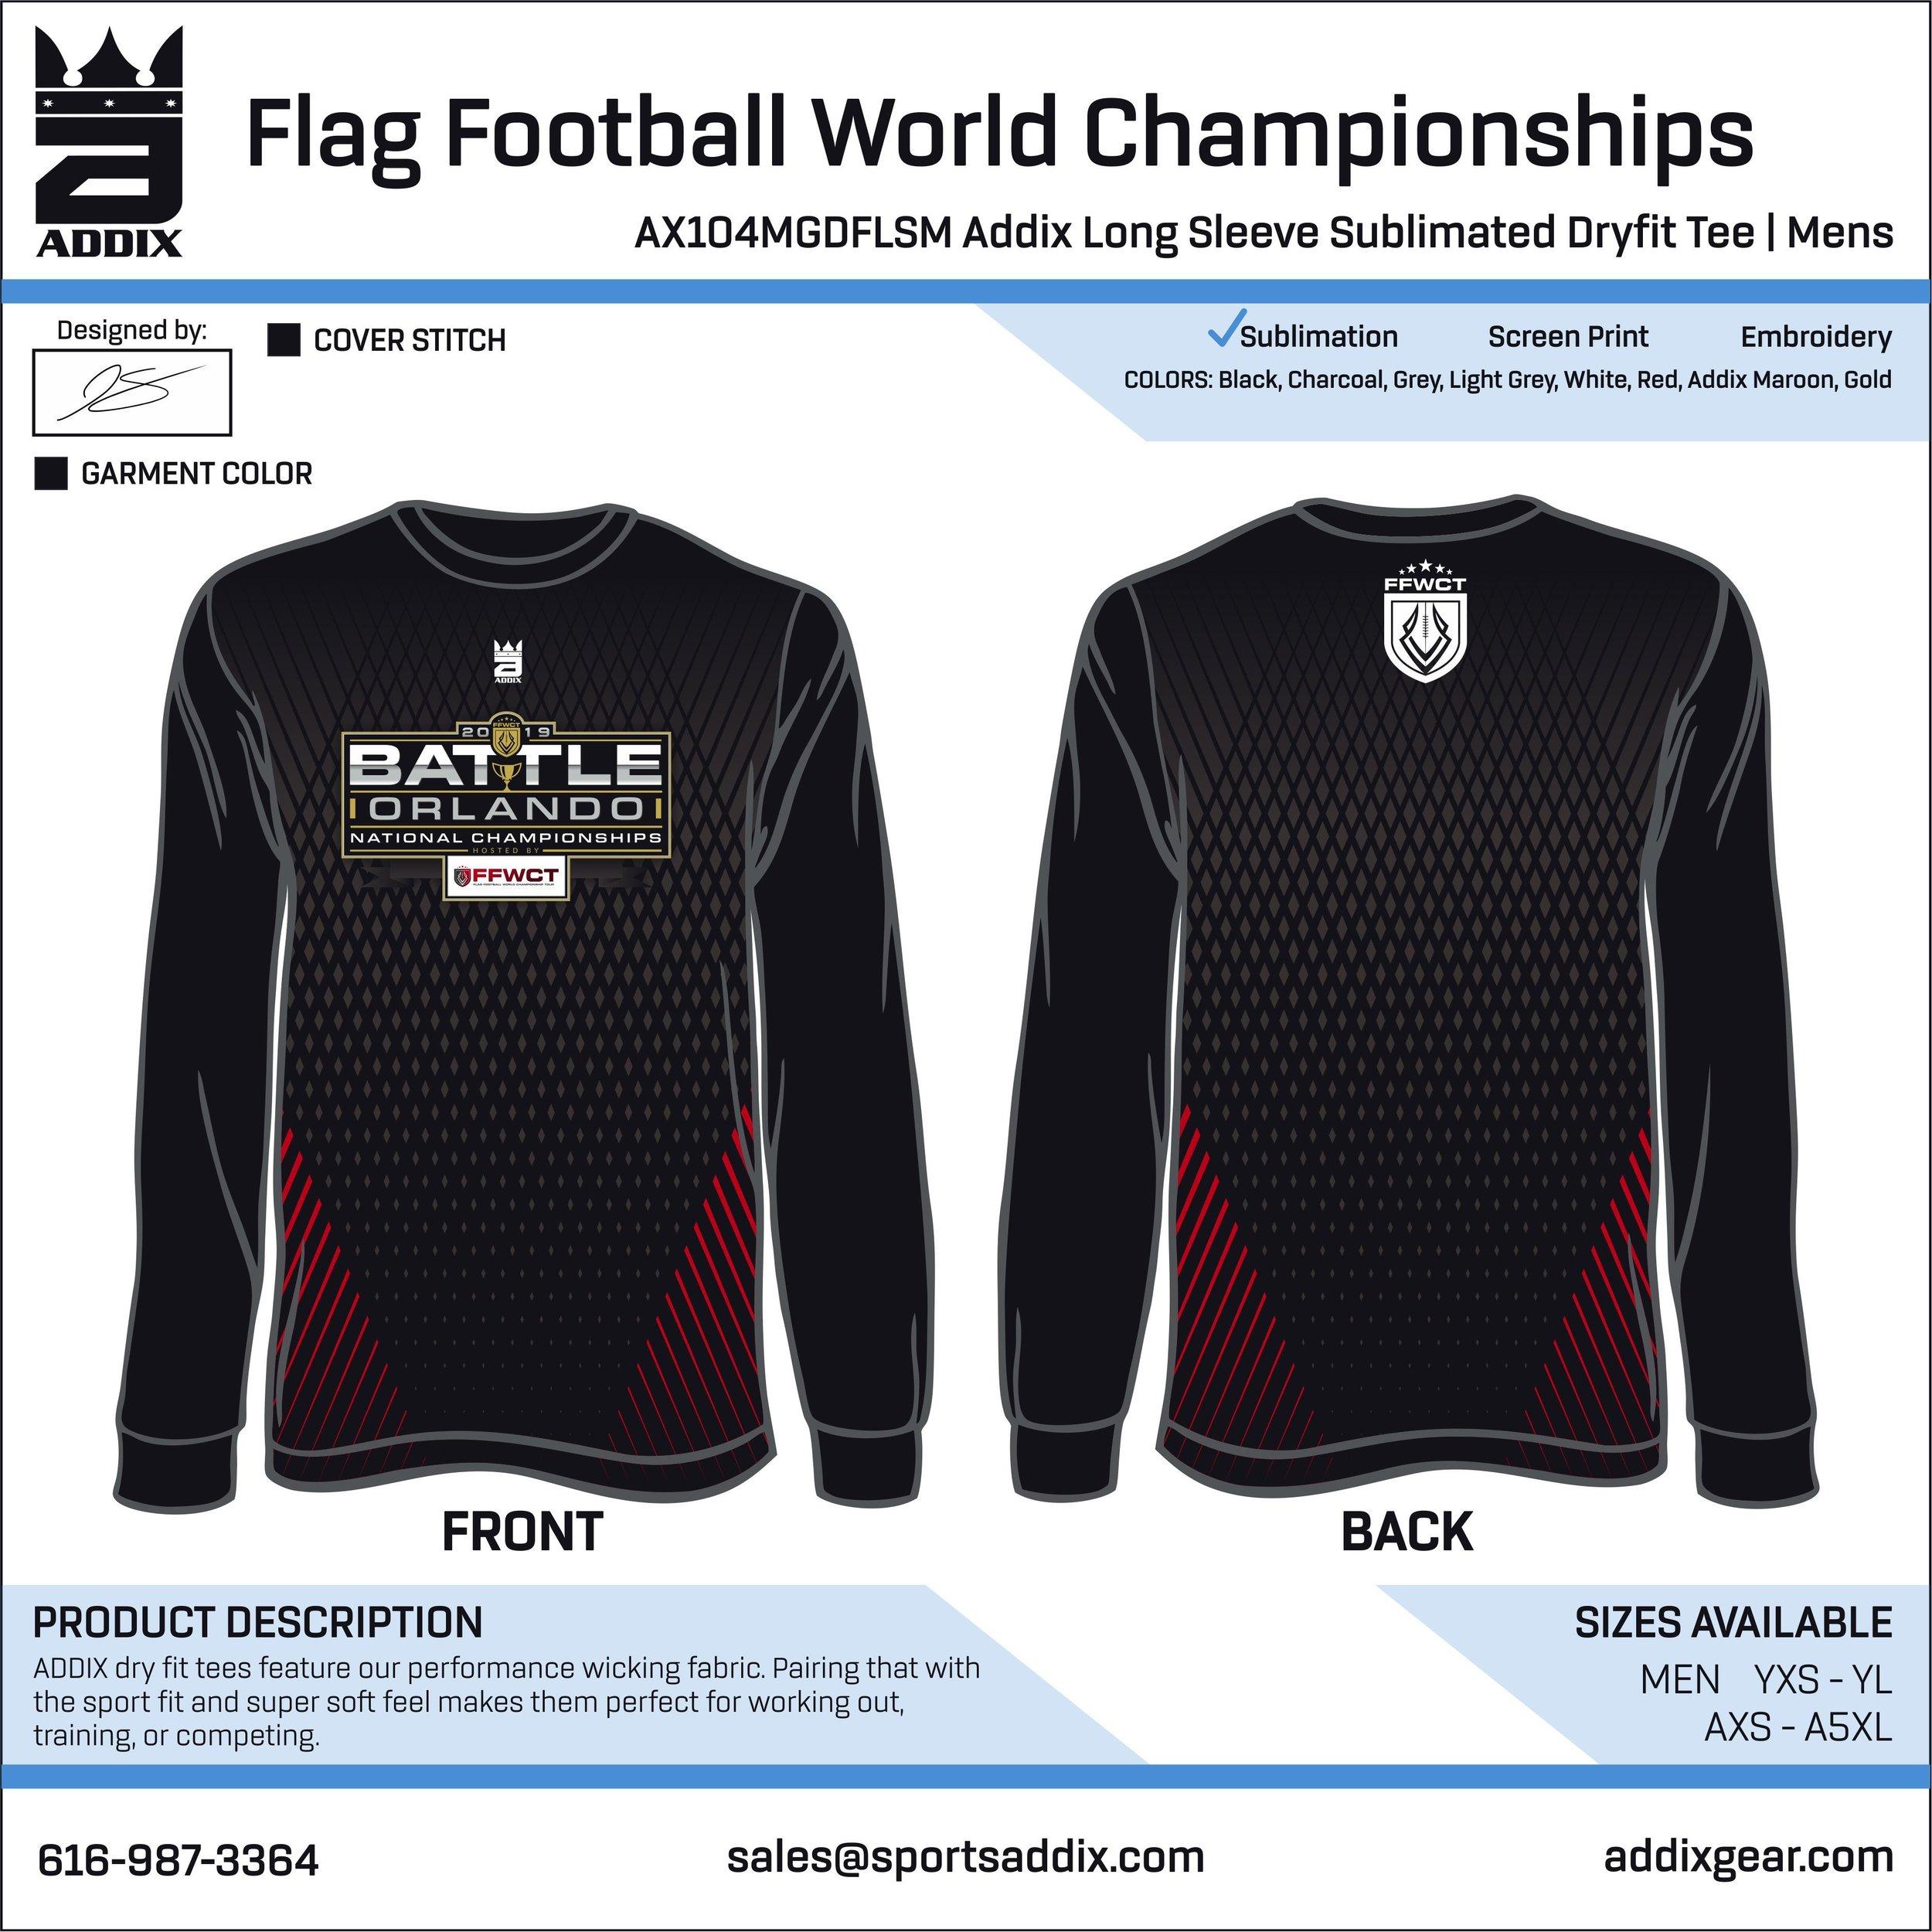 Flag Football World Championships_2018_12-19_JE_LS Full Sub DF.jpg